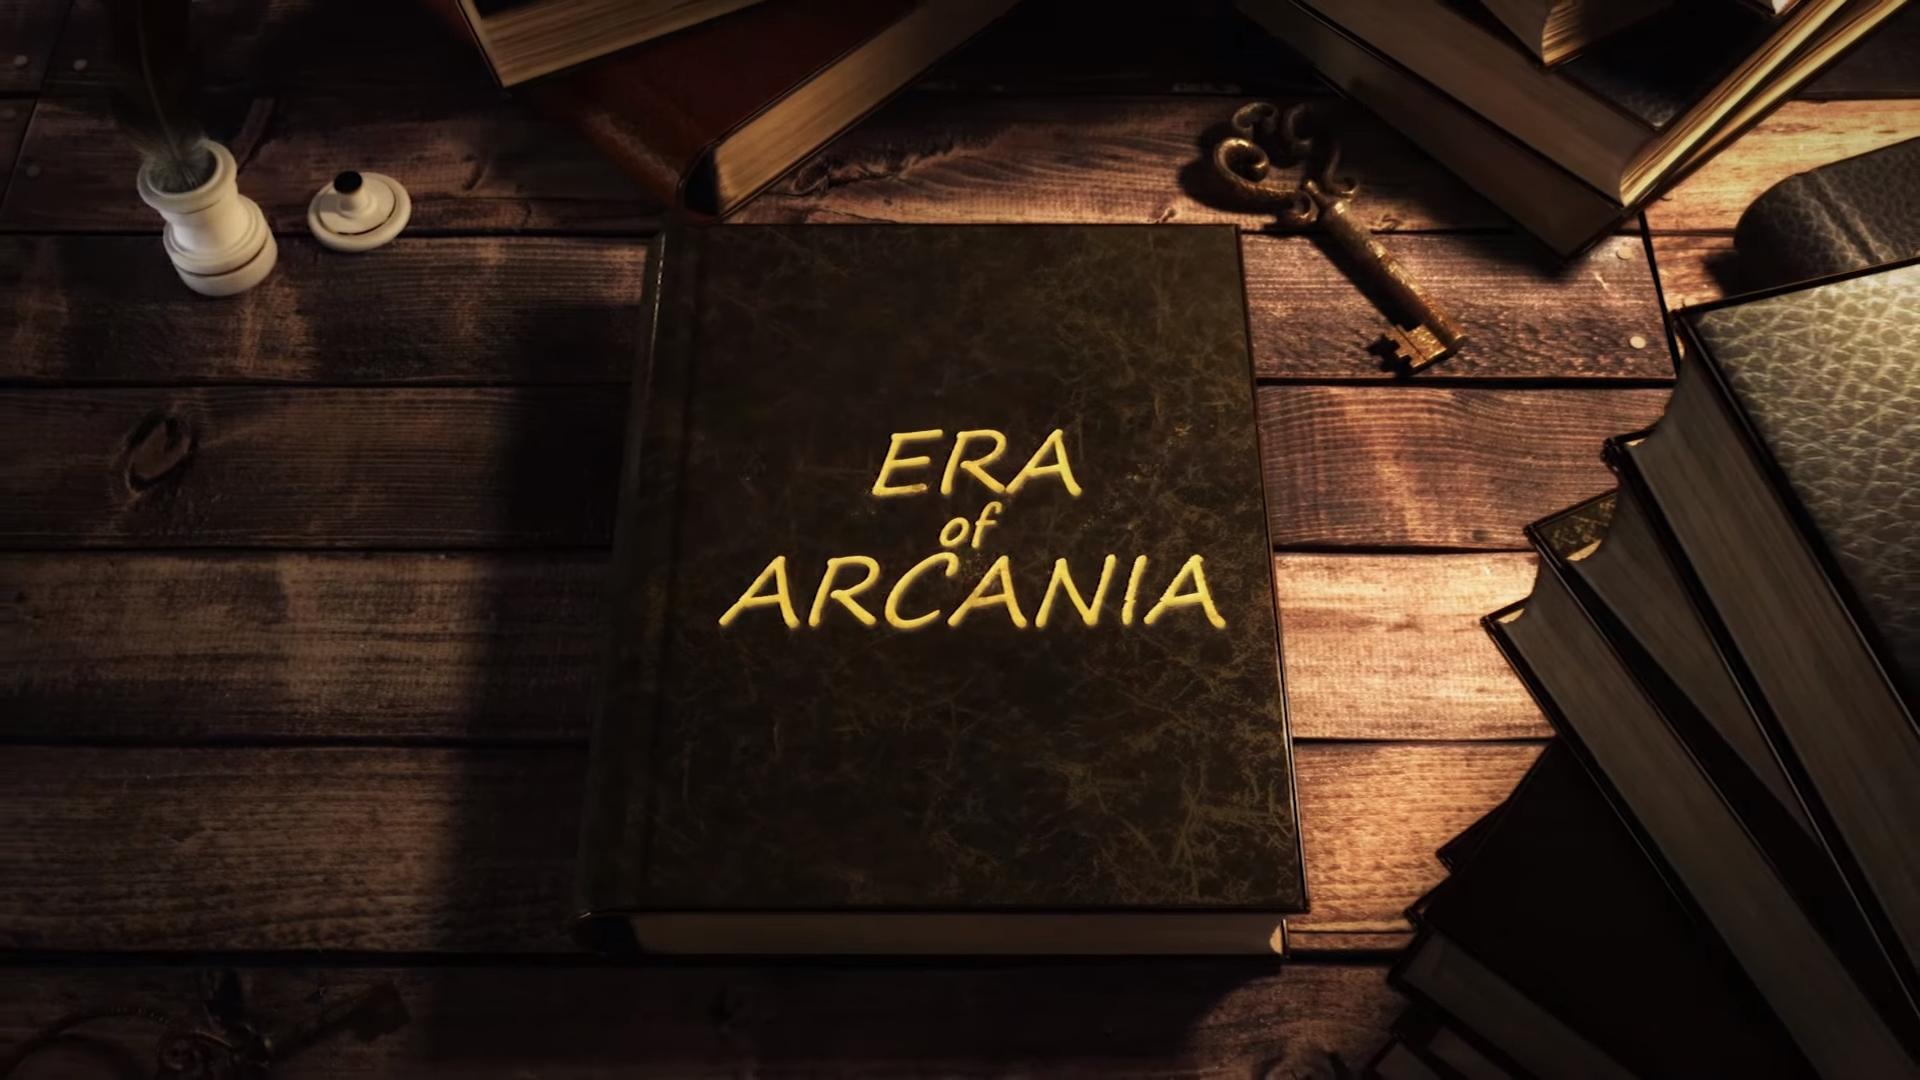 era of arcania 12102017 04